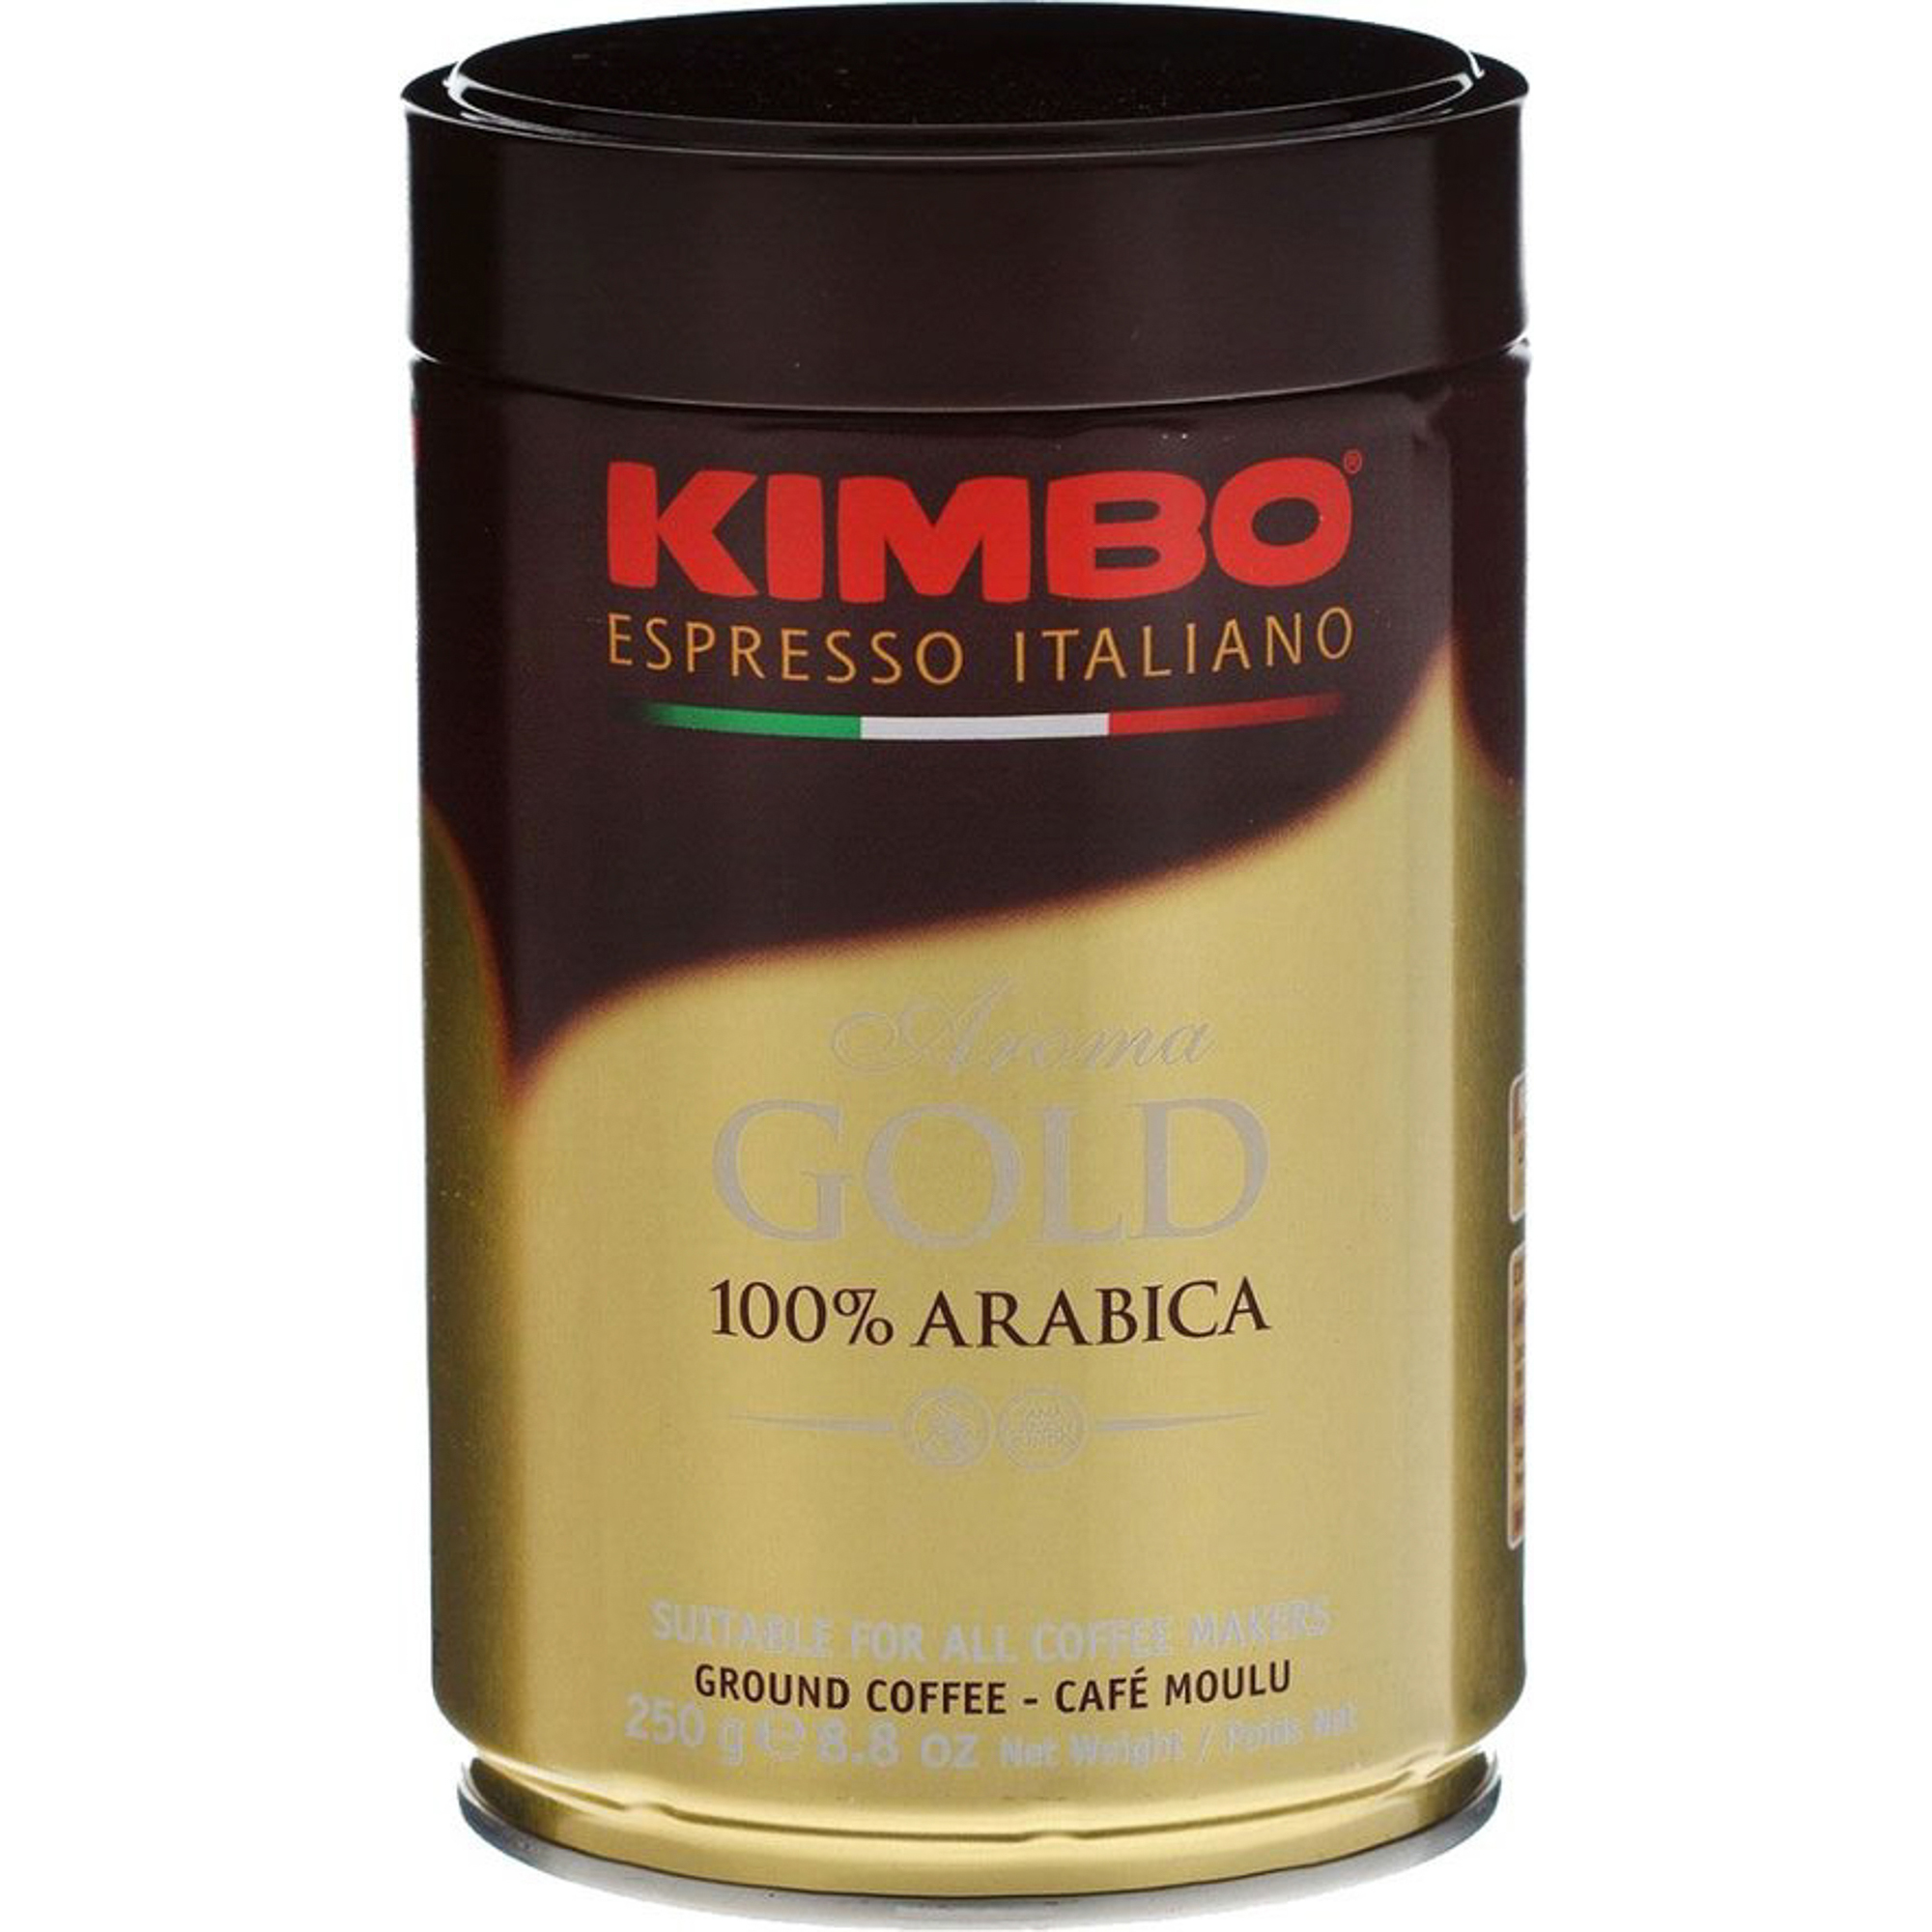 Кофе молотый Kimbo Aroma Gold 100% Arabica кофе молотый 250 г (ж/б) кофе в зернах kimbo aroma gold 100% arabica 250 г